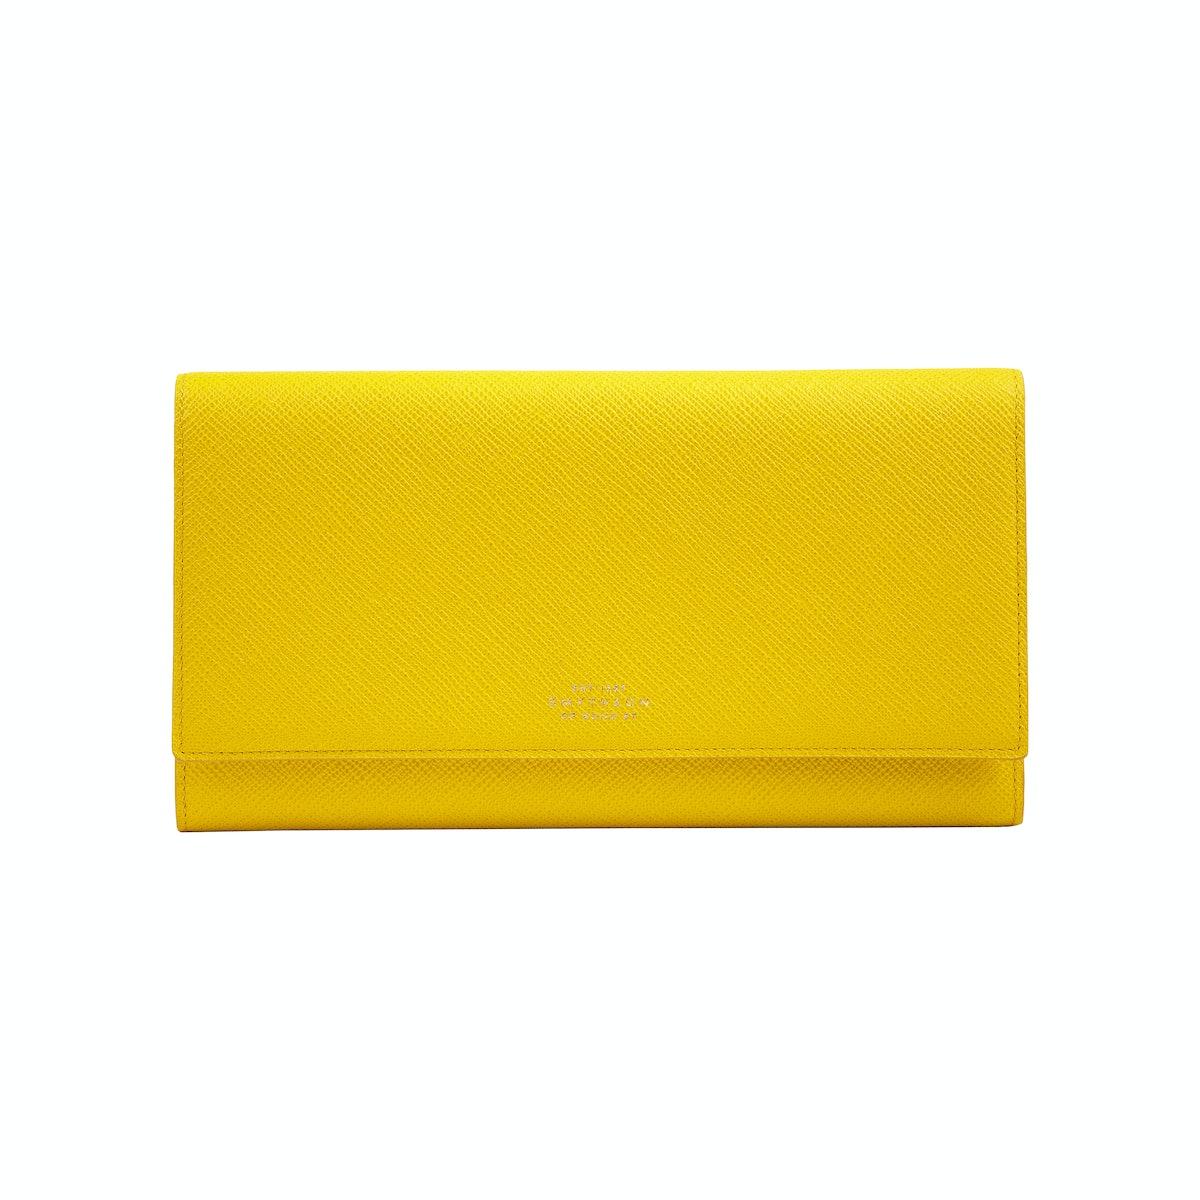 Yellow Smythson wallet